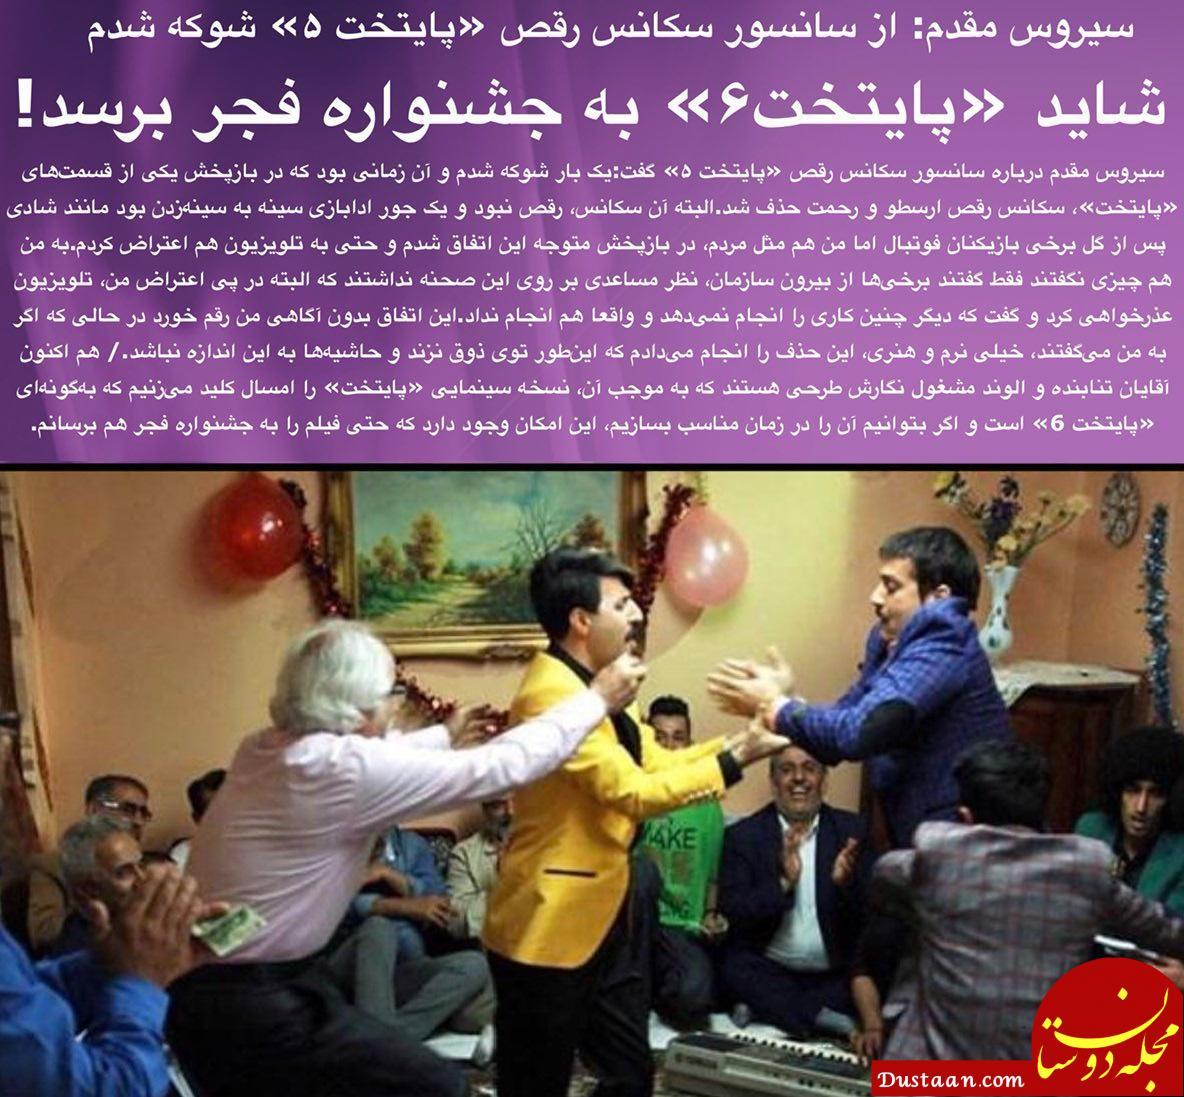 www.dustaan.com سیروس مقدم: امکان دارد فیلم سینمایی «پایتخت» به جشنواره فجر برسد